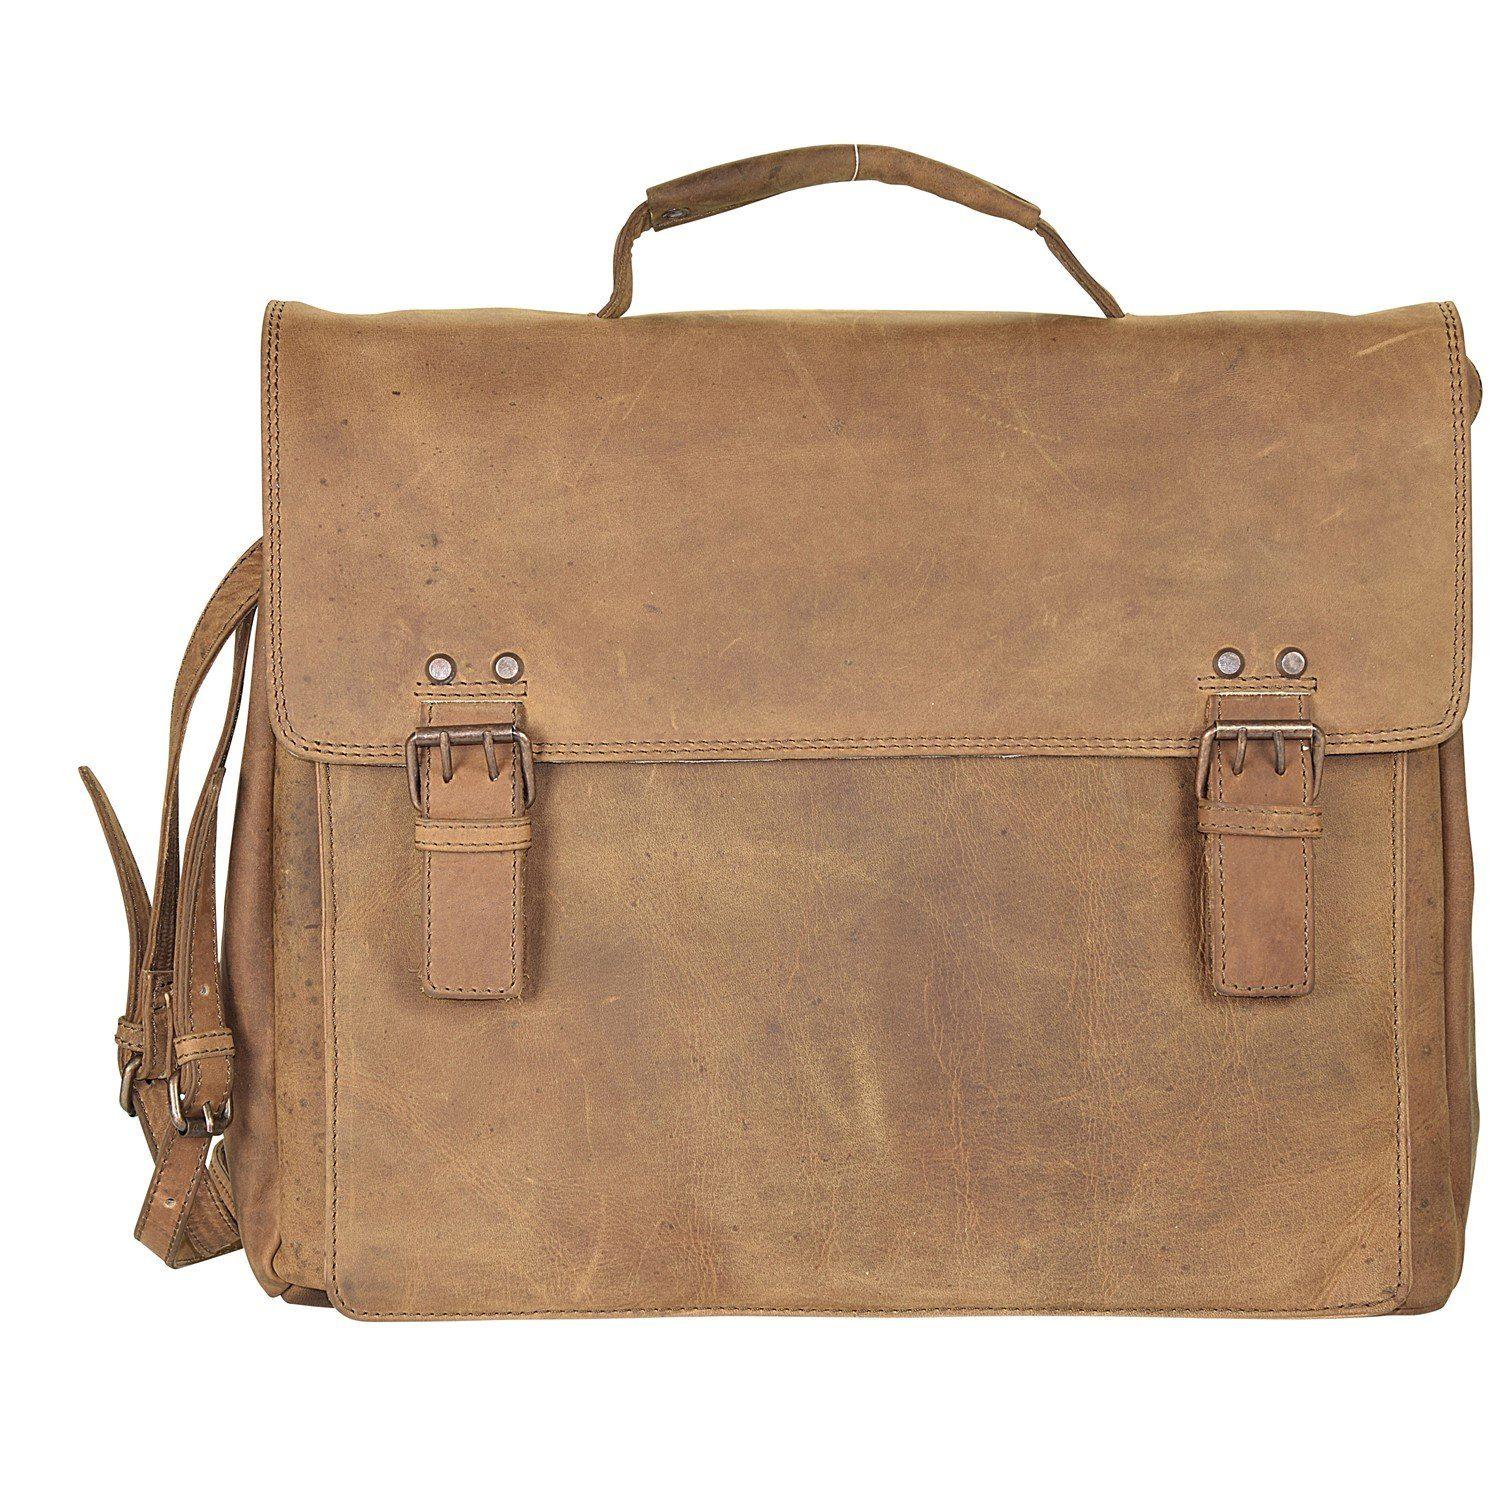 Harold's Antik Casual Aktentasche Leder 38 cm Laptoptafach